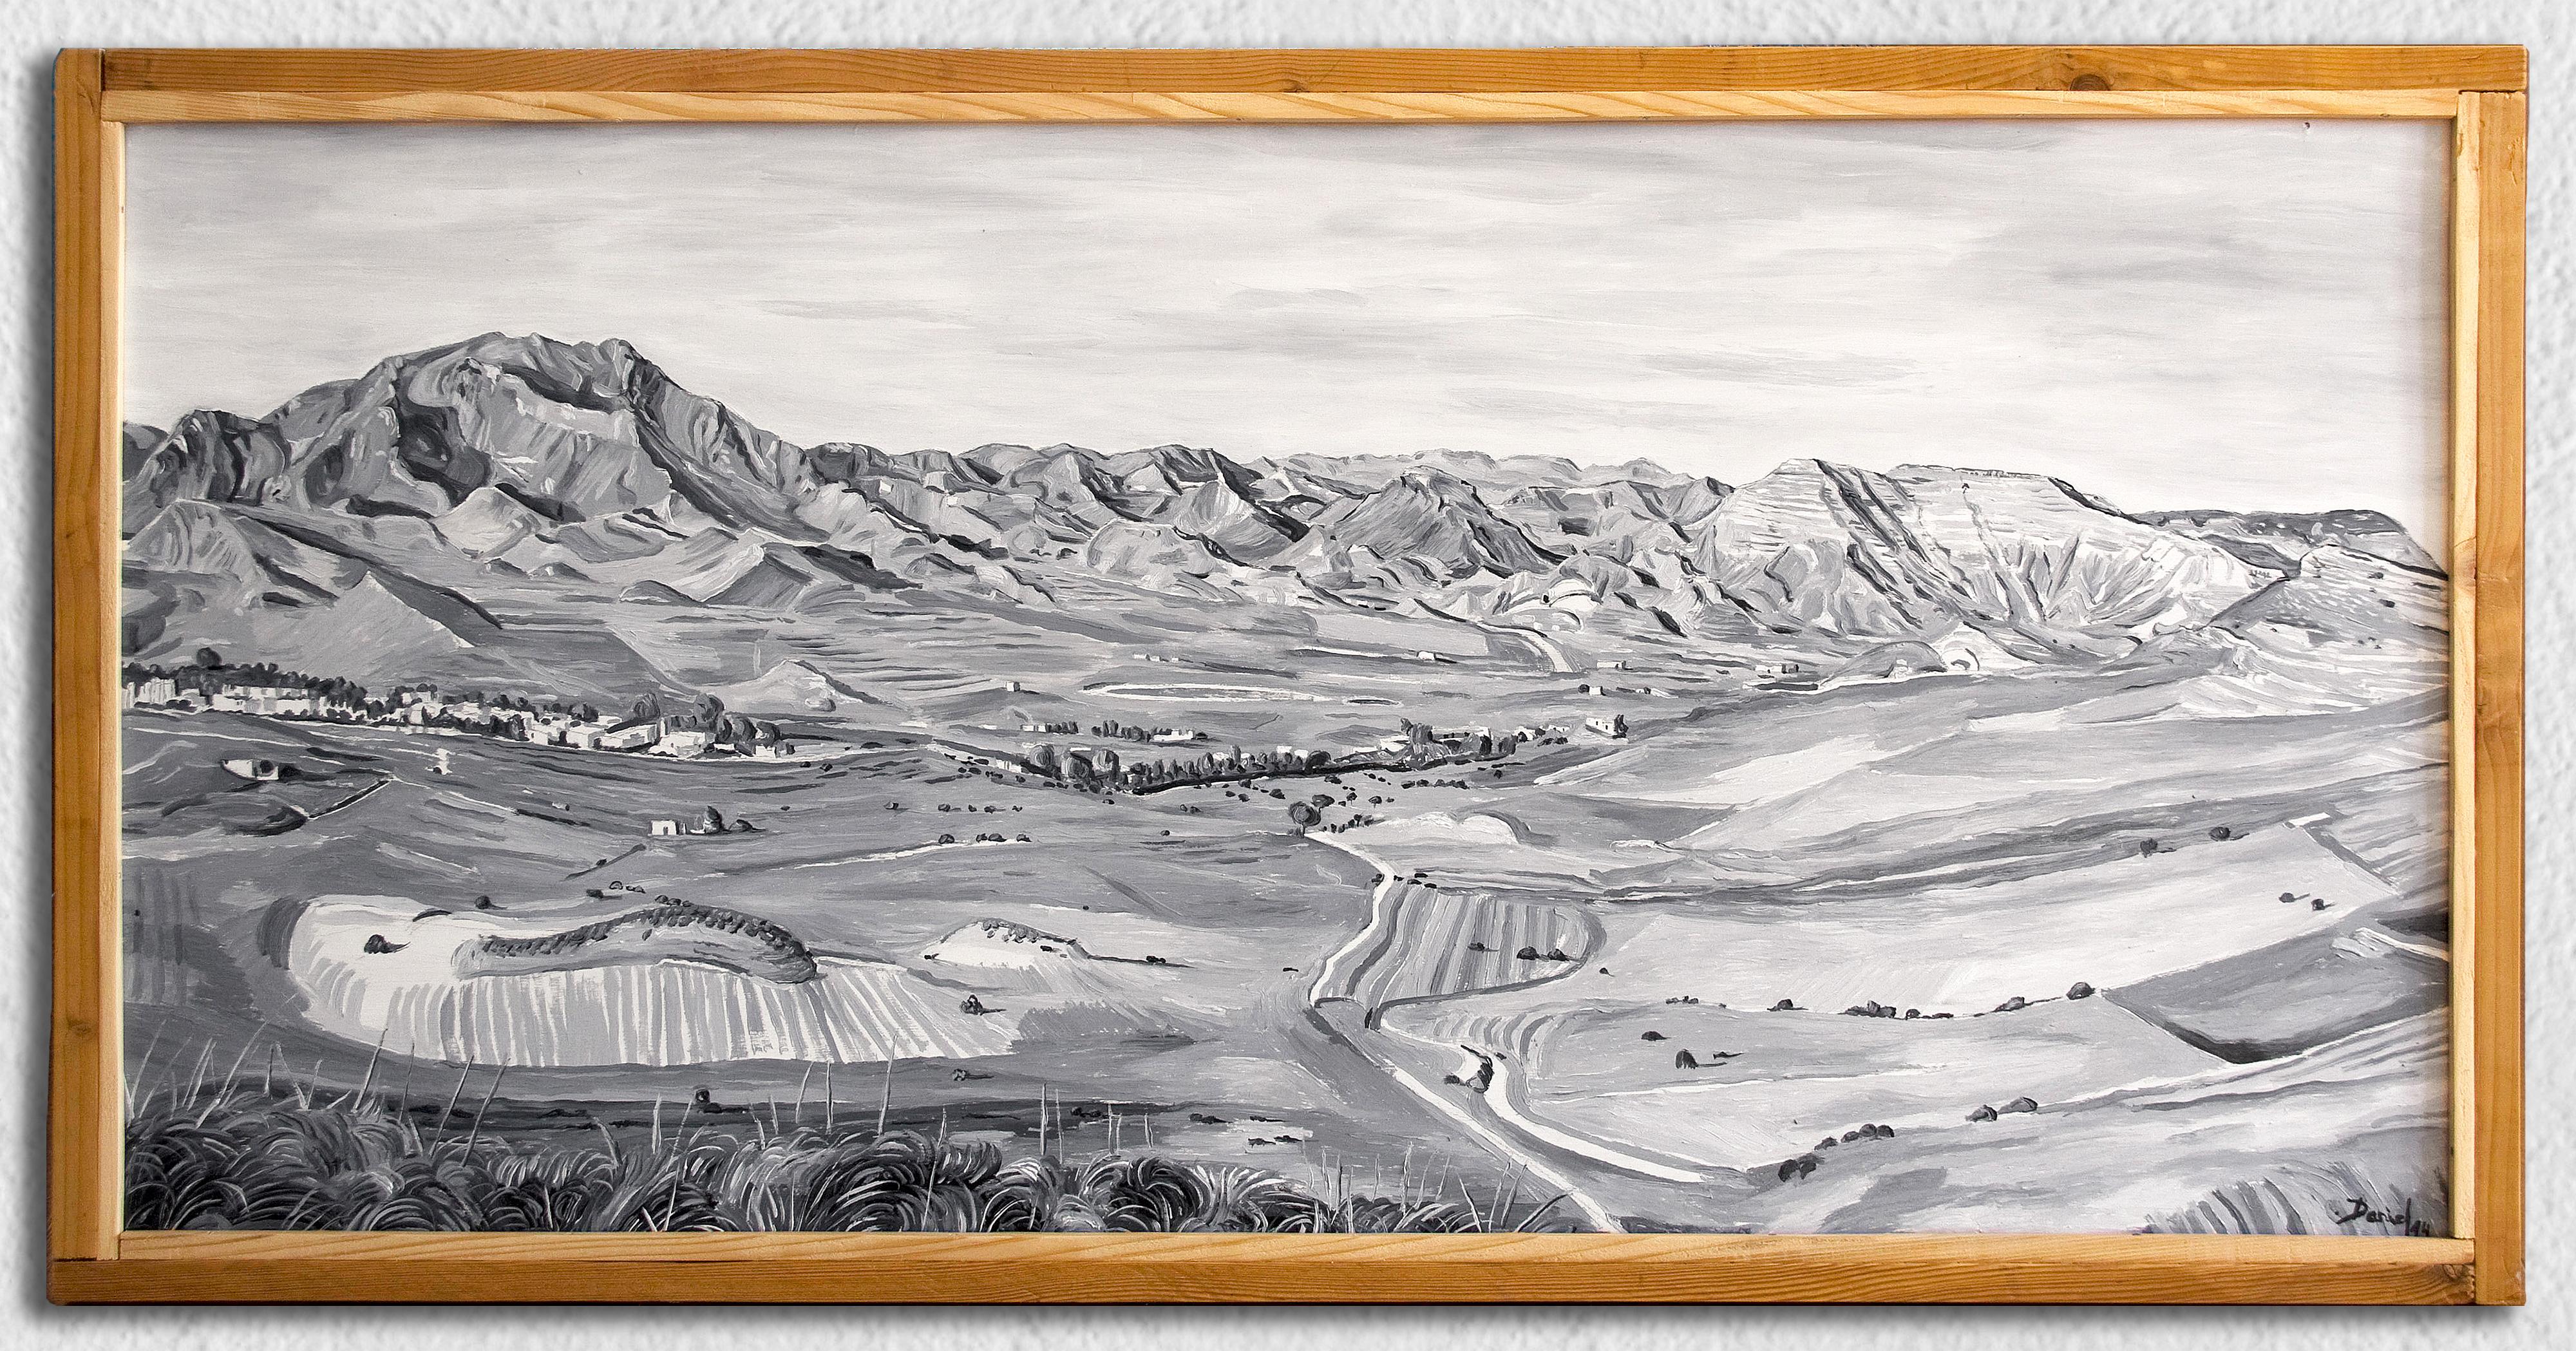 Vista del valle de Rodalquilar